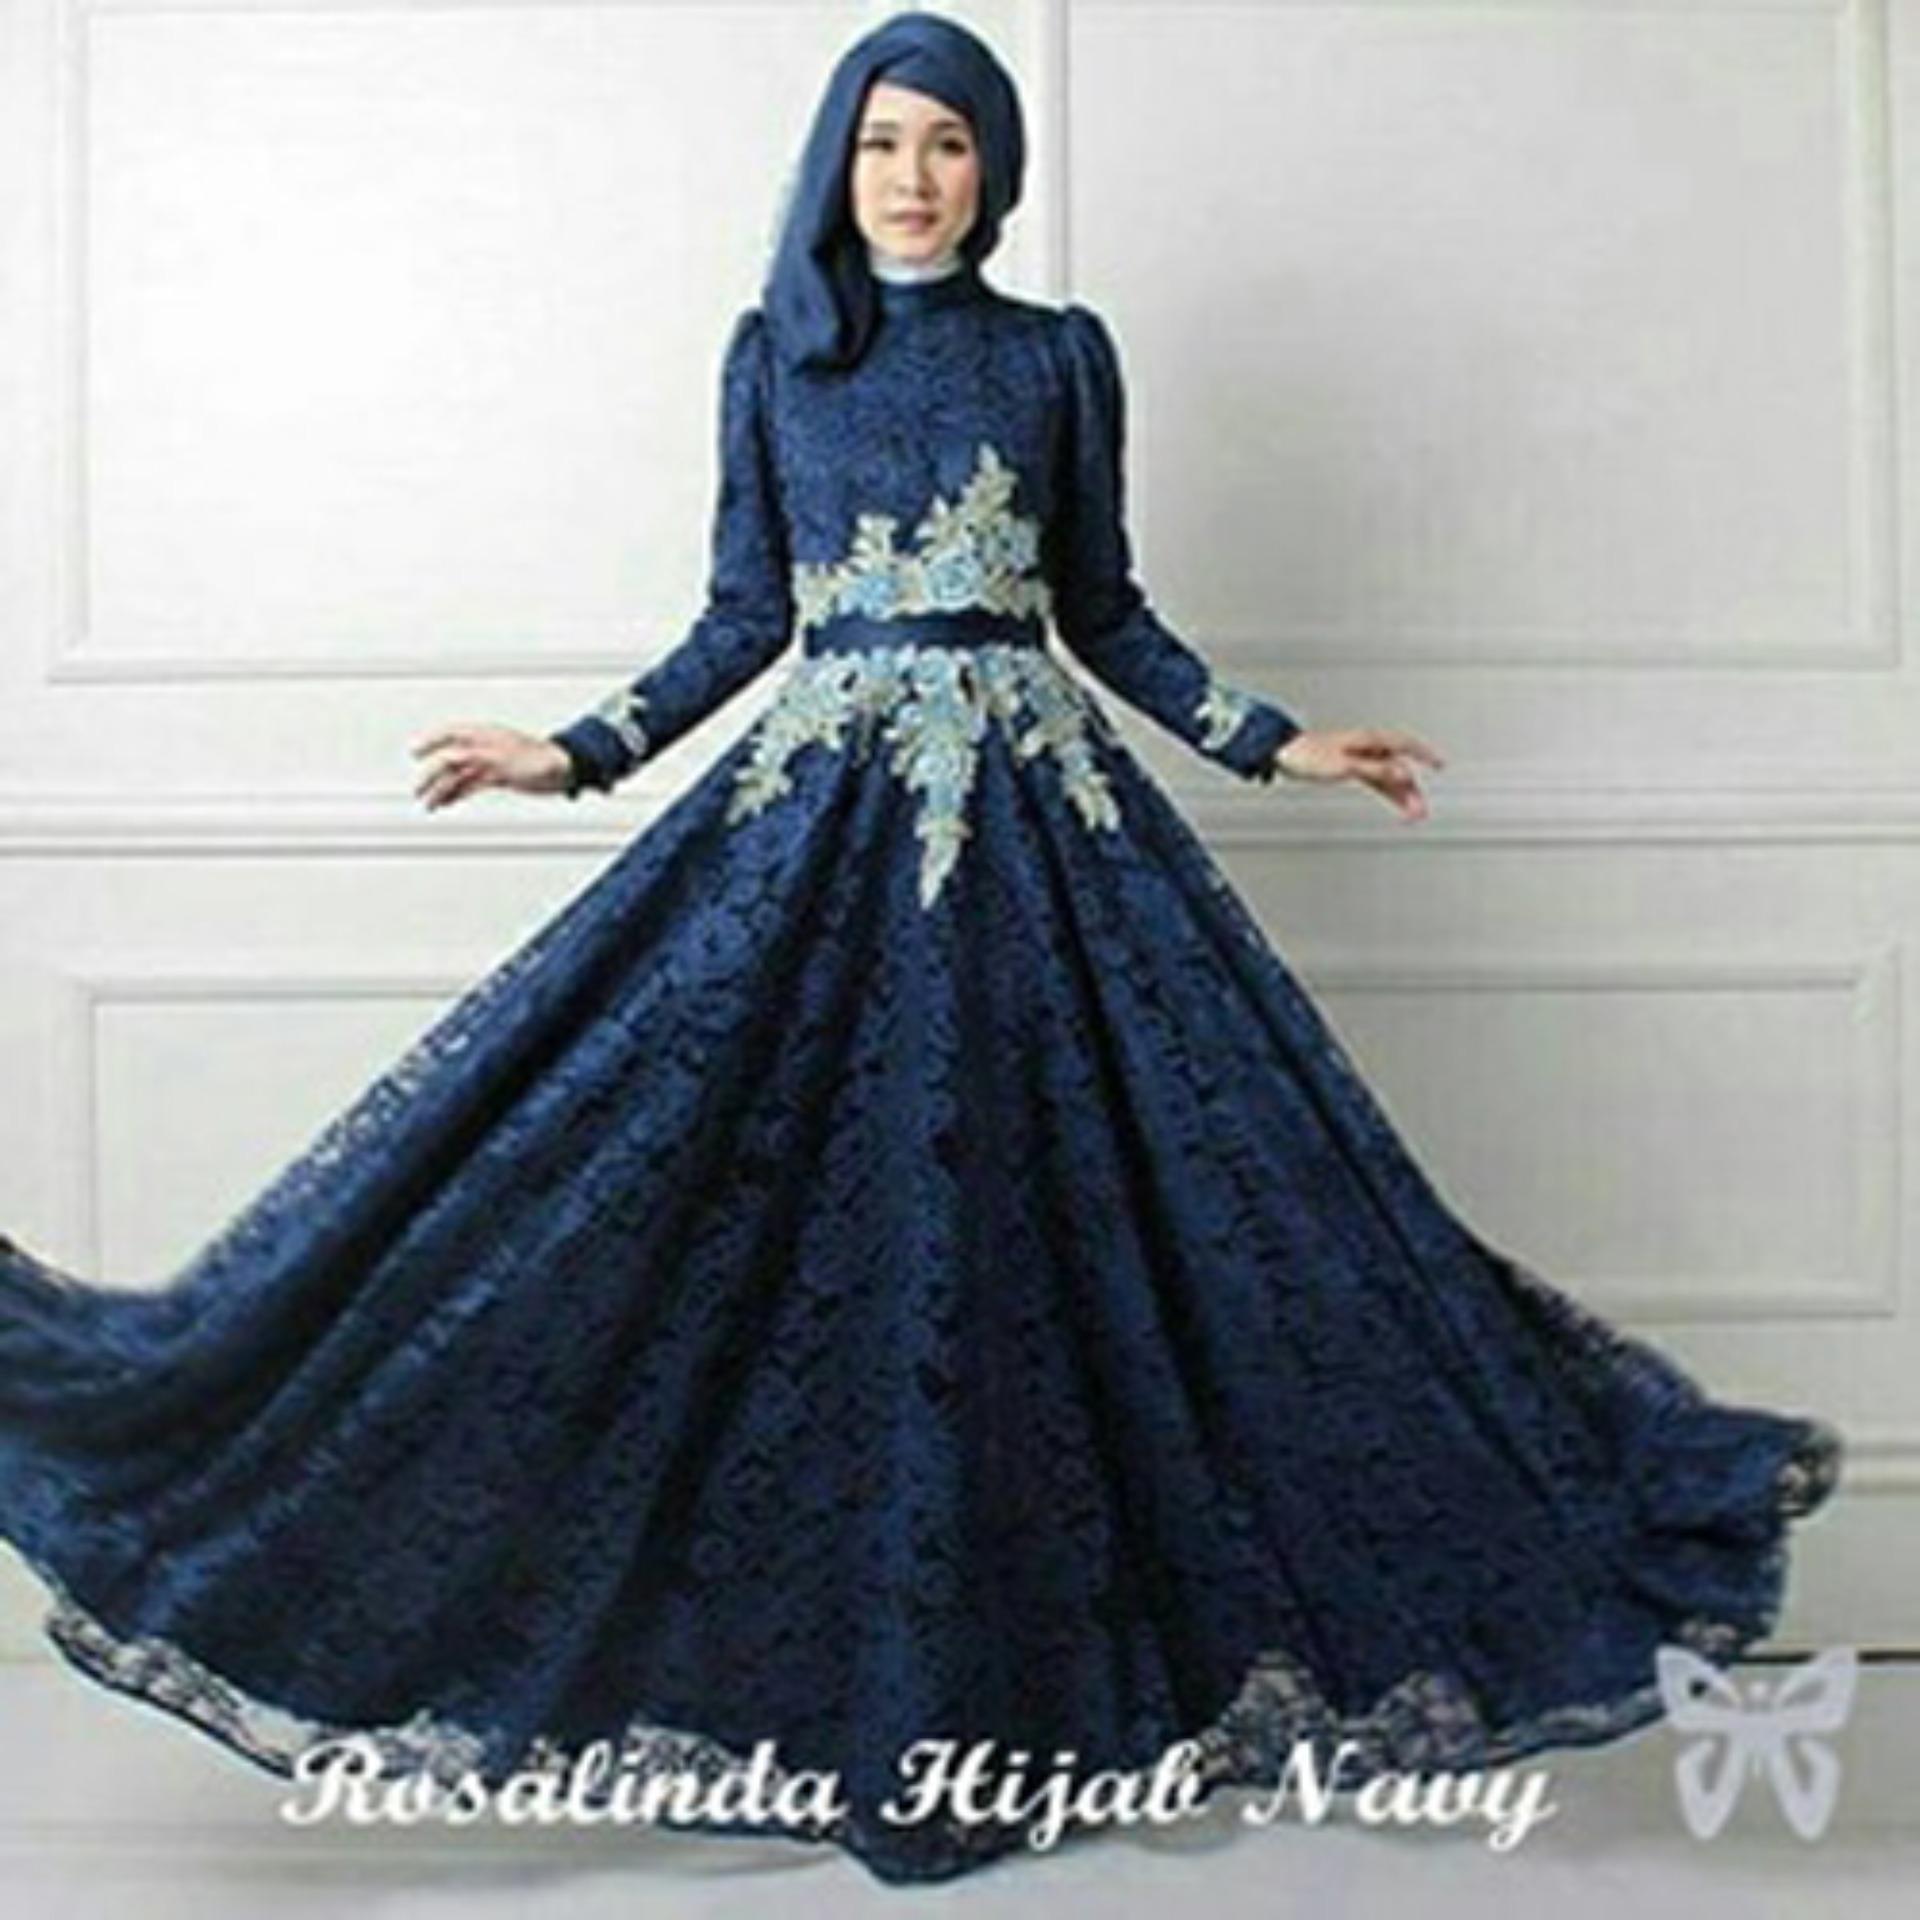 Gamis Syari Pesta - Hijab Dress Terbaru - Baju Kondangan Muslimah Syari - Dress Muslim - Gaun Pesta Muslim - Kebaya Modern - Maxi Dress Brukat - Gamis Brokat - ihrosalinda